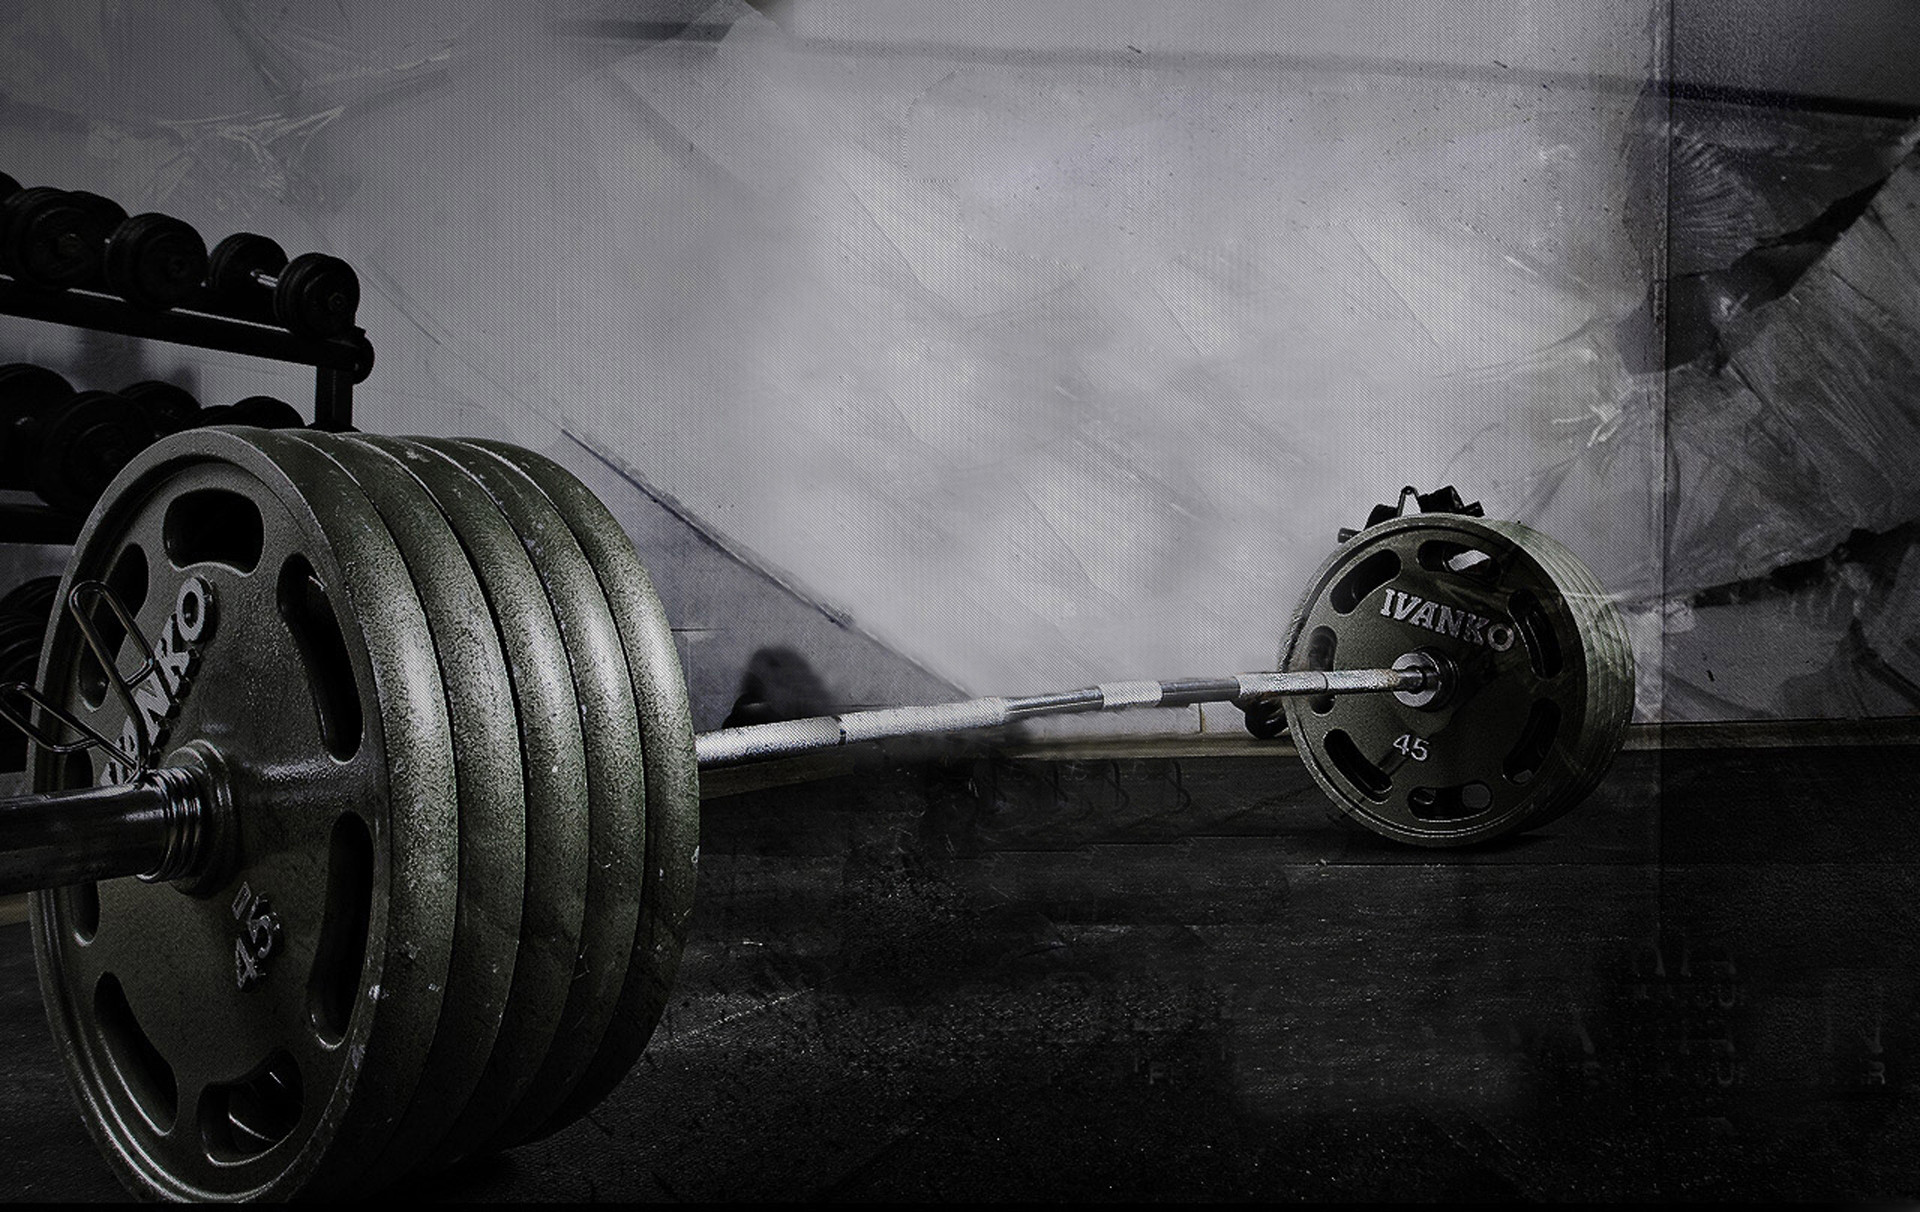 Weight lifting weight bar workout hd wallpaper of size 1920×1080.